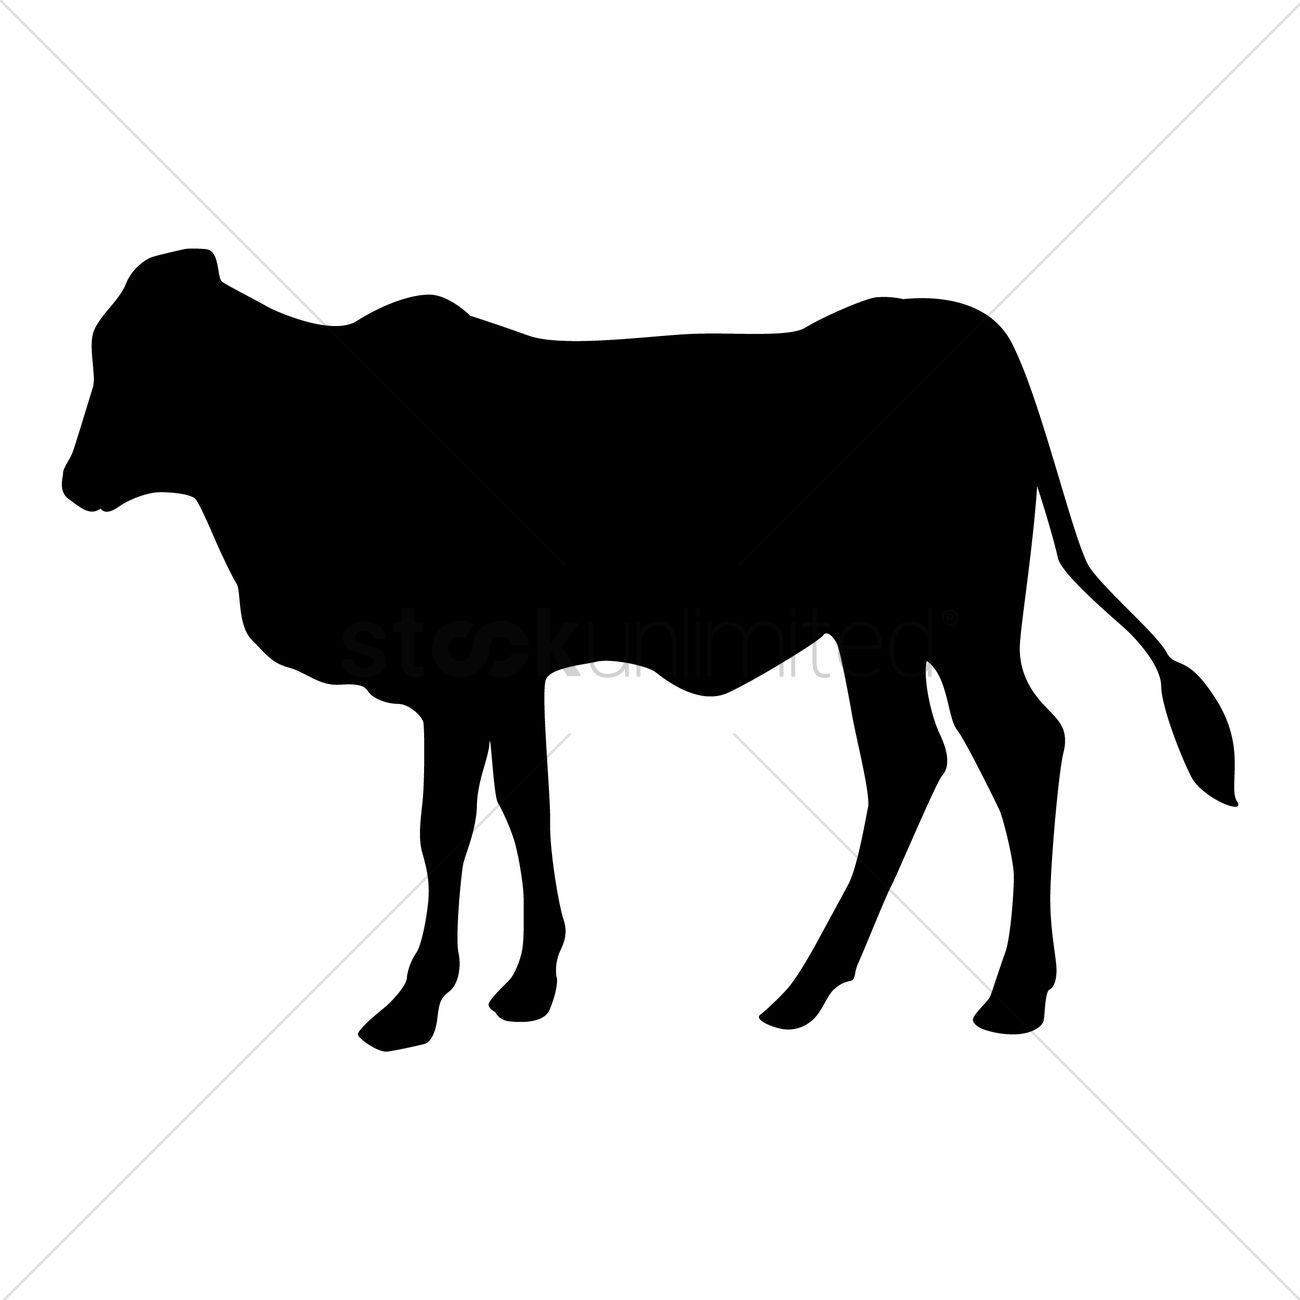 1300x1300 Chart Charts Beef Cut Cuts Butcher Butchers Cow Cows Animal